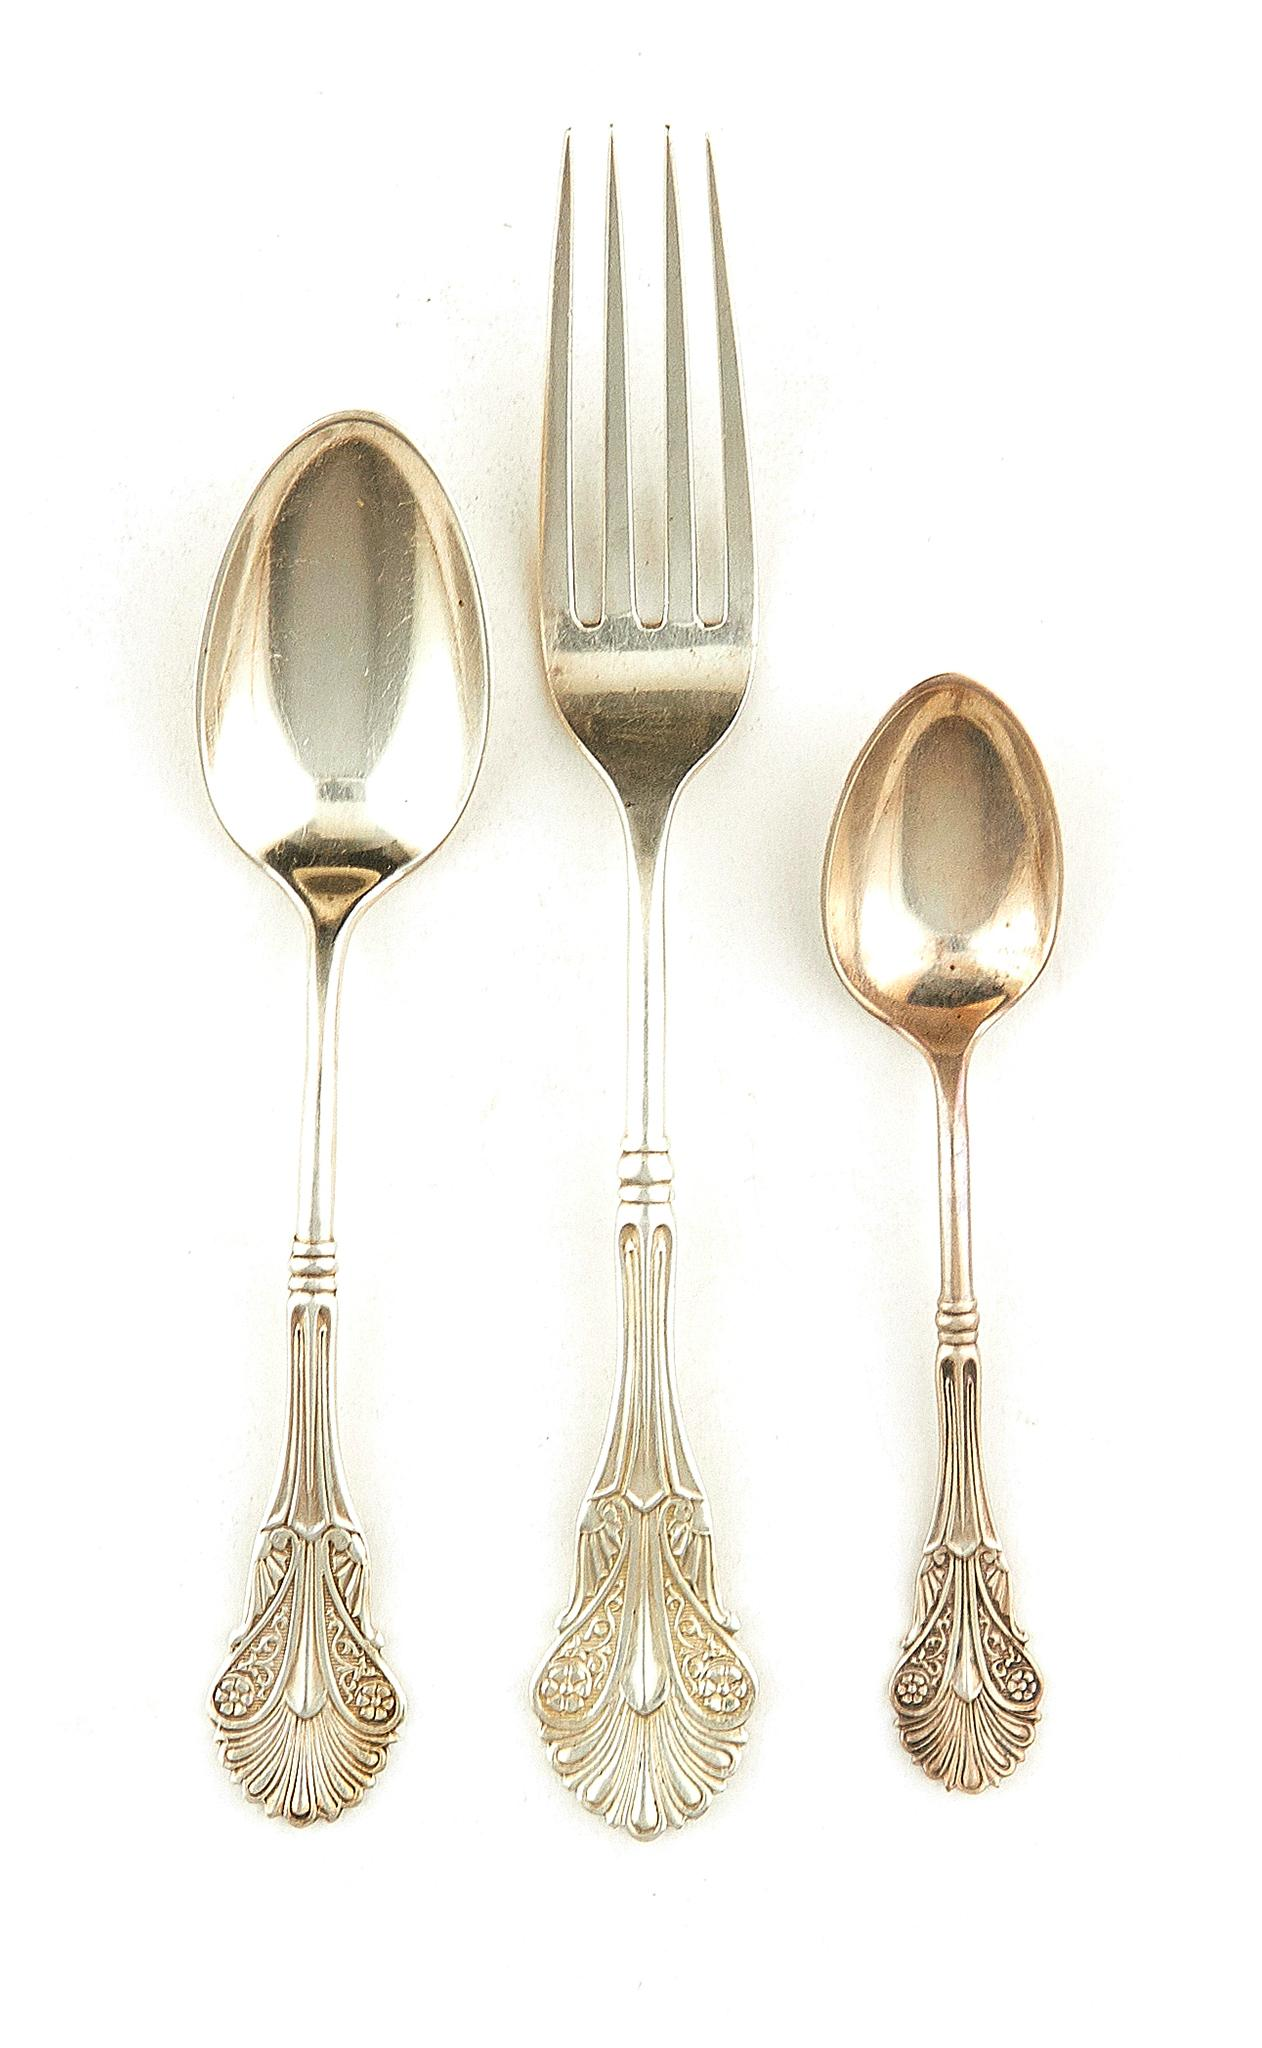 American silver flatware, George W. Shiebler and Tiffany & Co (36pcs)